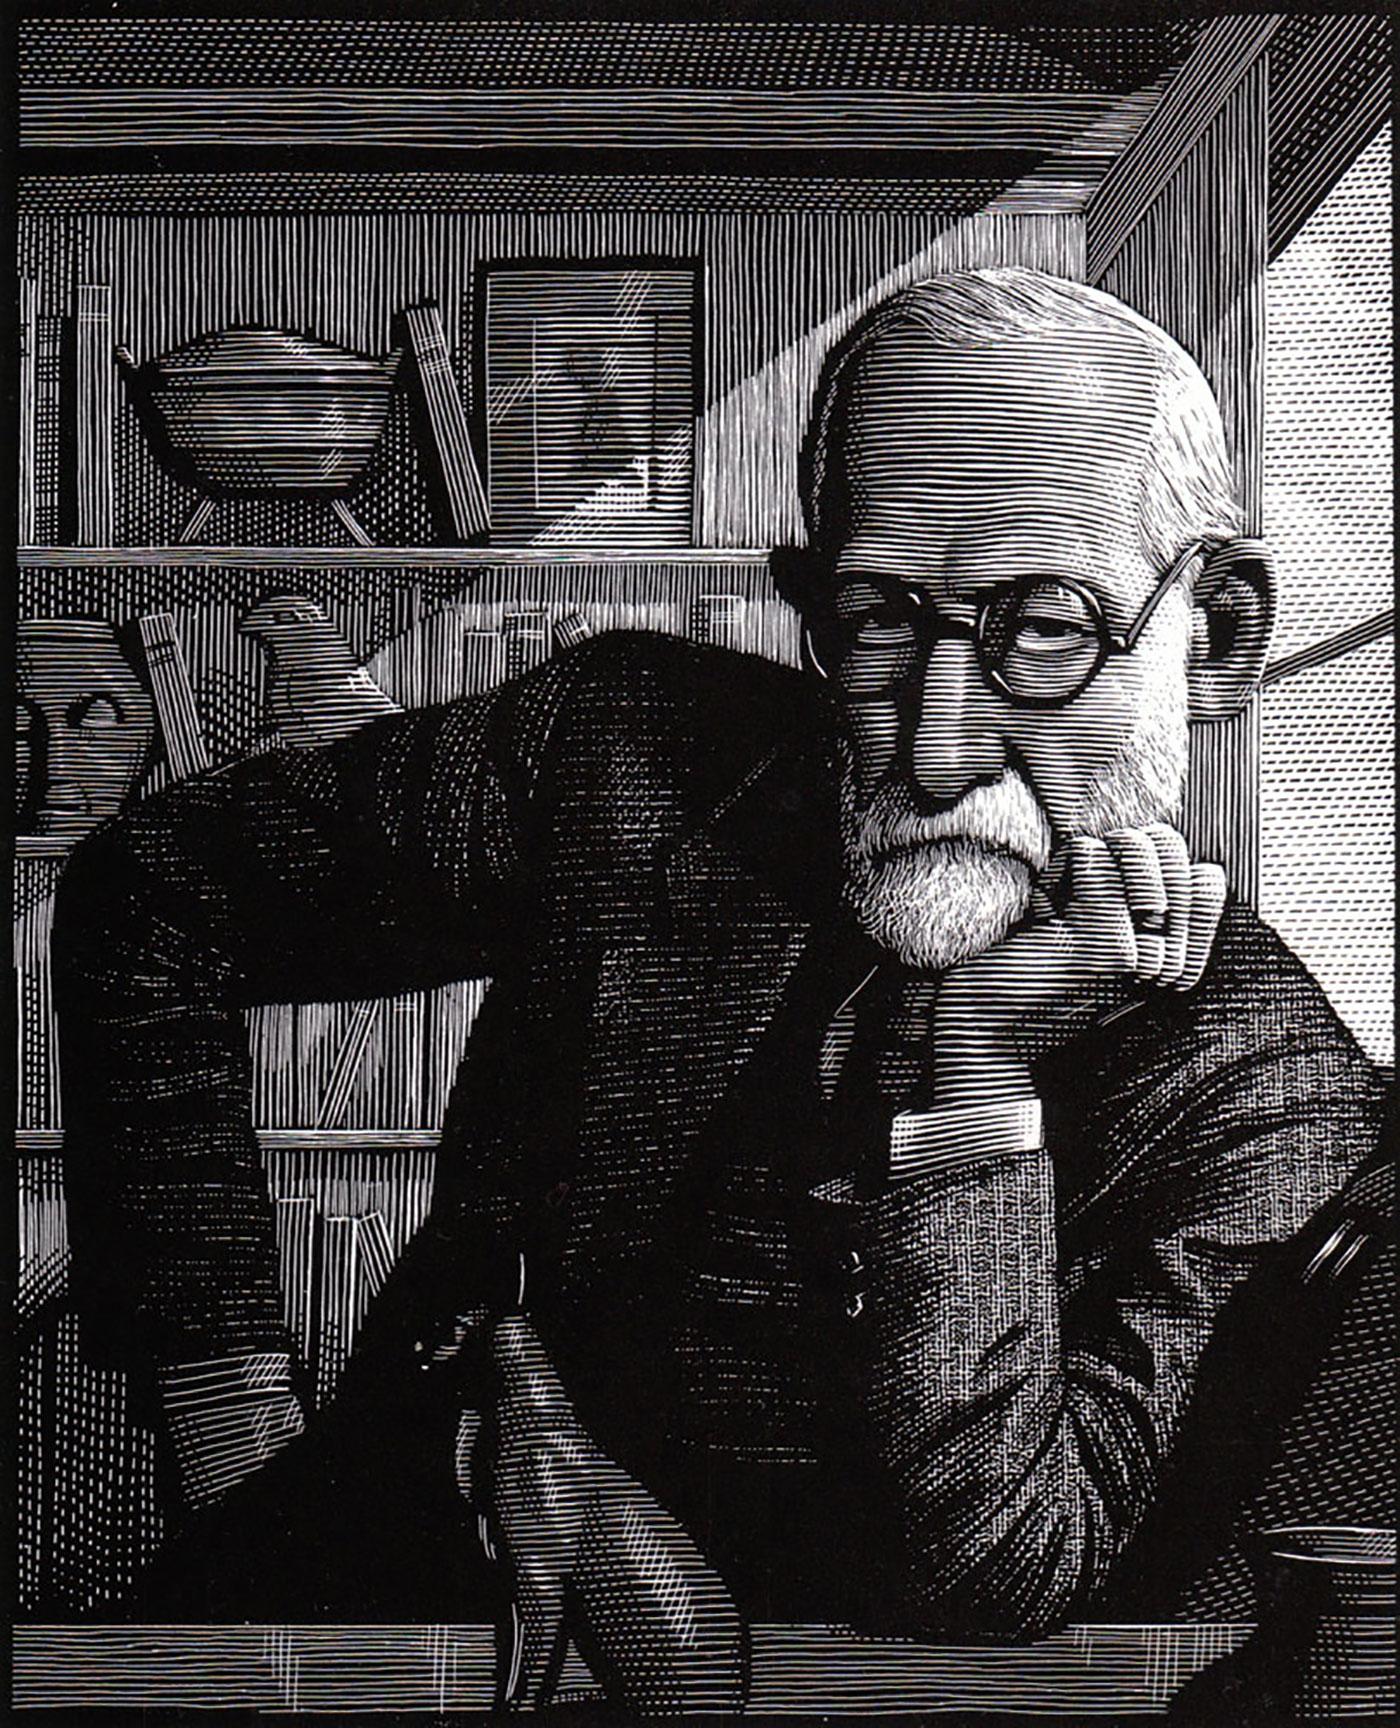 Richard Solomon - Mark-Summers-155-P-Sigmund-Freud